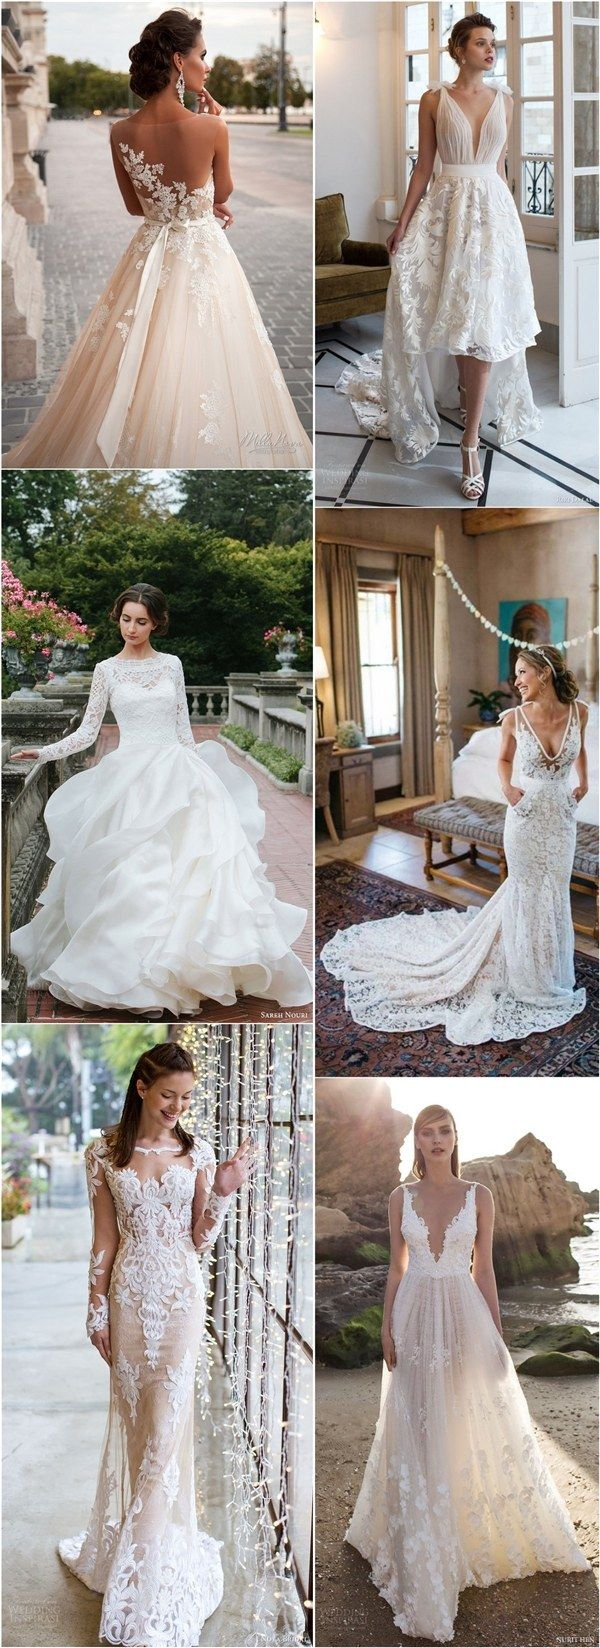 Bellas wedding dress  Federica Concas federicakikka on Pinterest